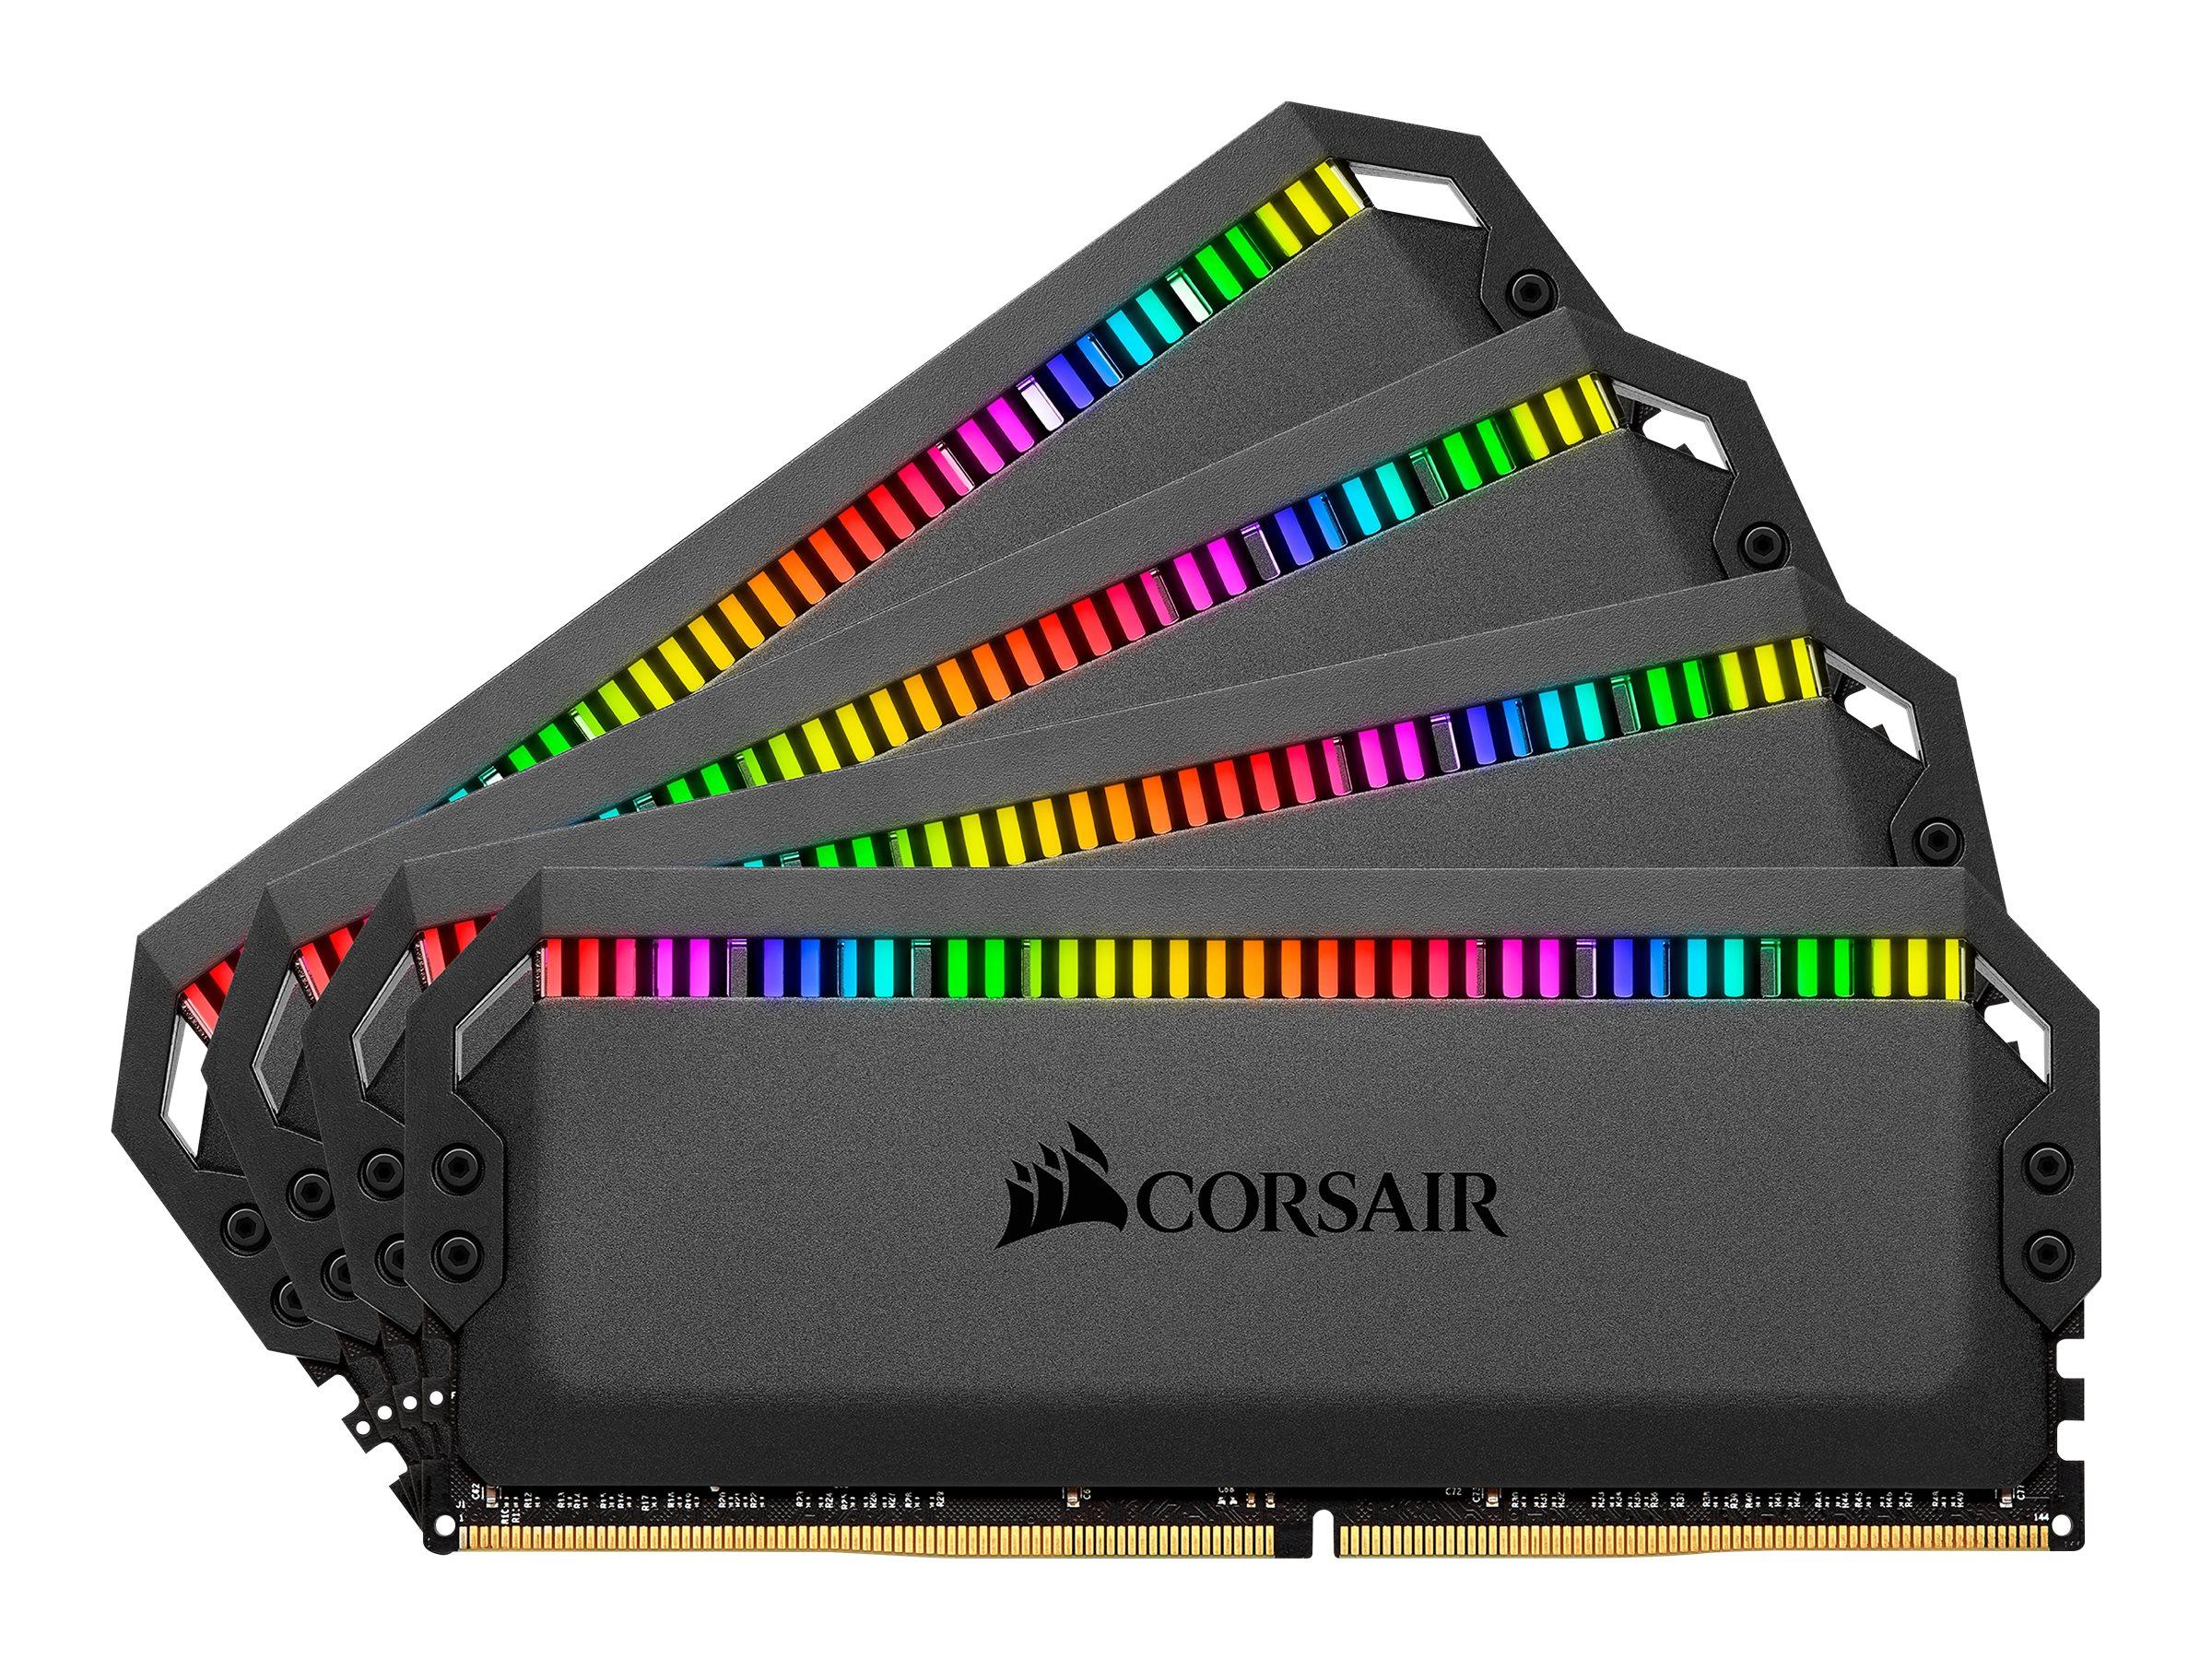 Corsair Dominator Platinum RGB - DDR4 - 64 GB Set: 4 x 16 GB